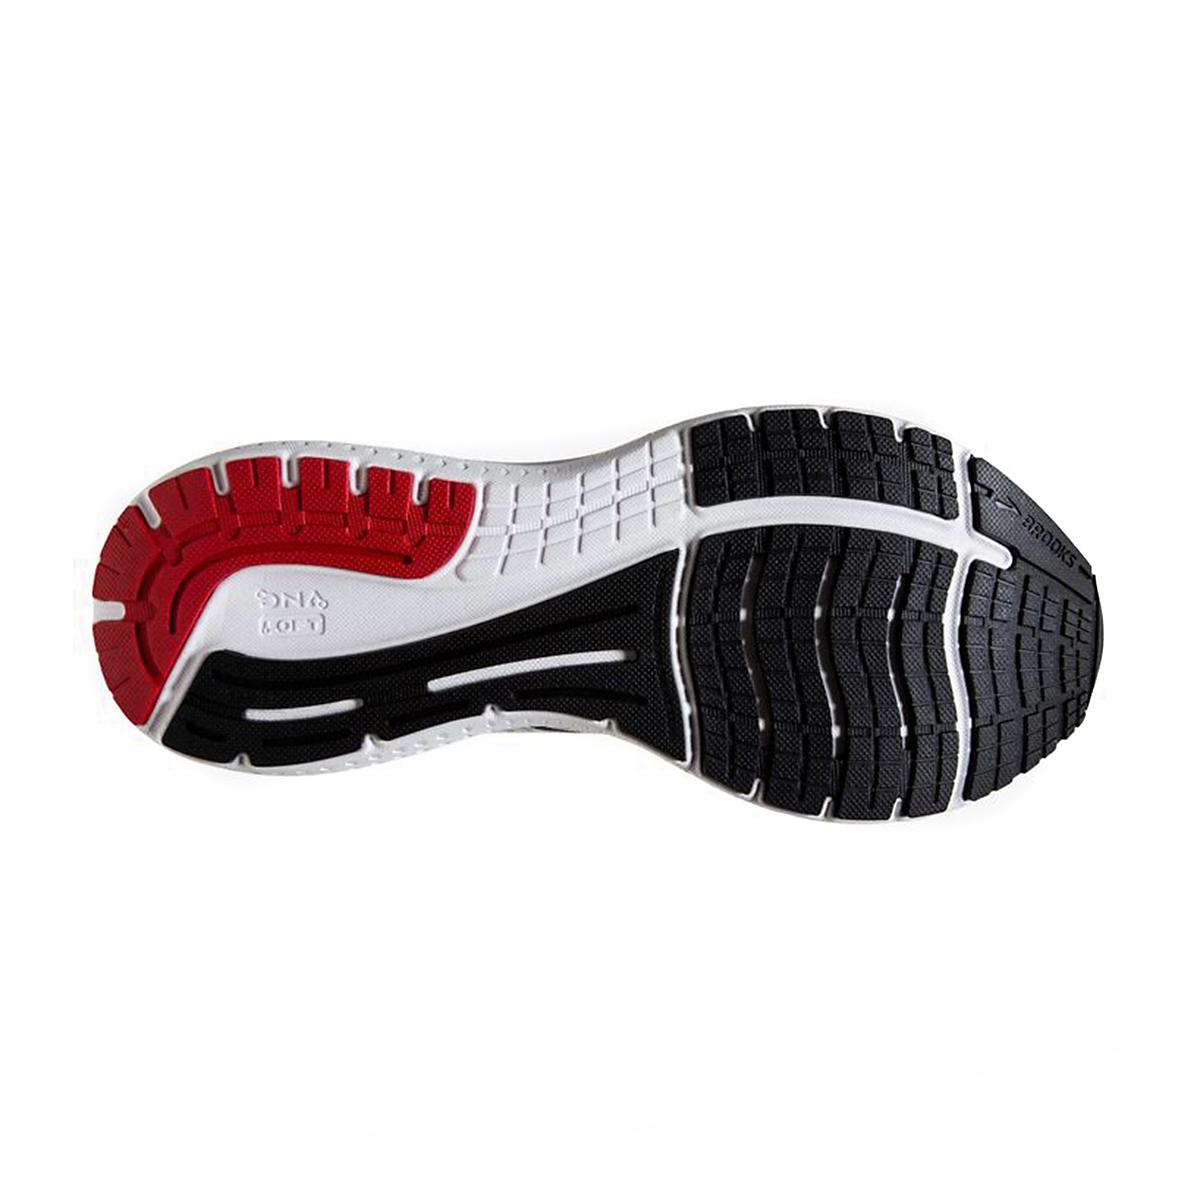 Men's Brooks Glycerin 19 Running Shoe - Color: White/Black/Red - Size: 7 - Width: Regular, White/Black/Red, large, image 6